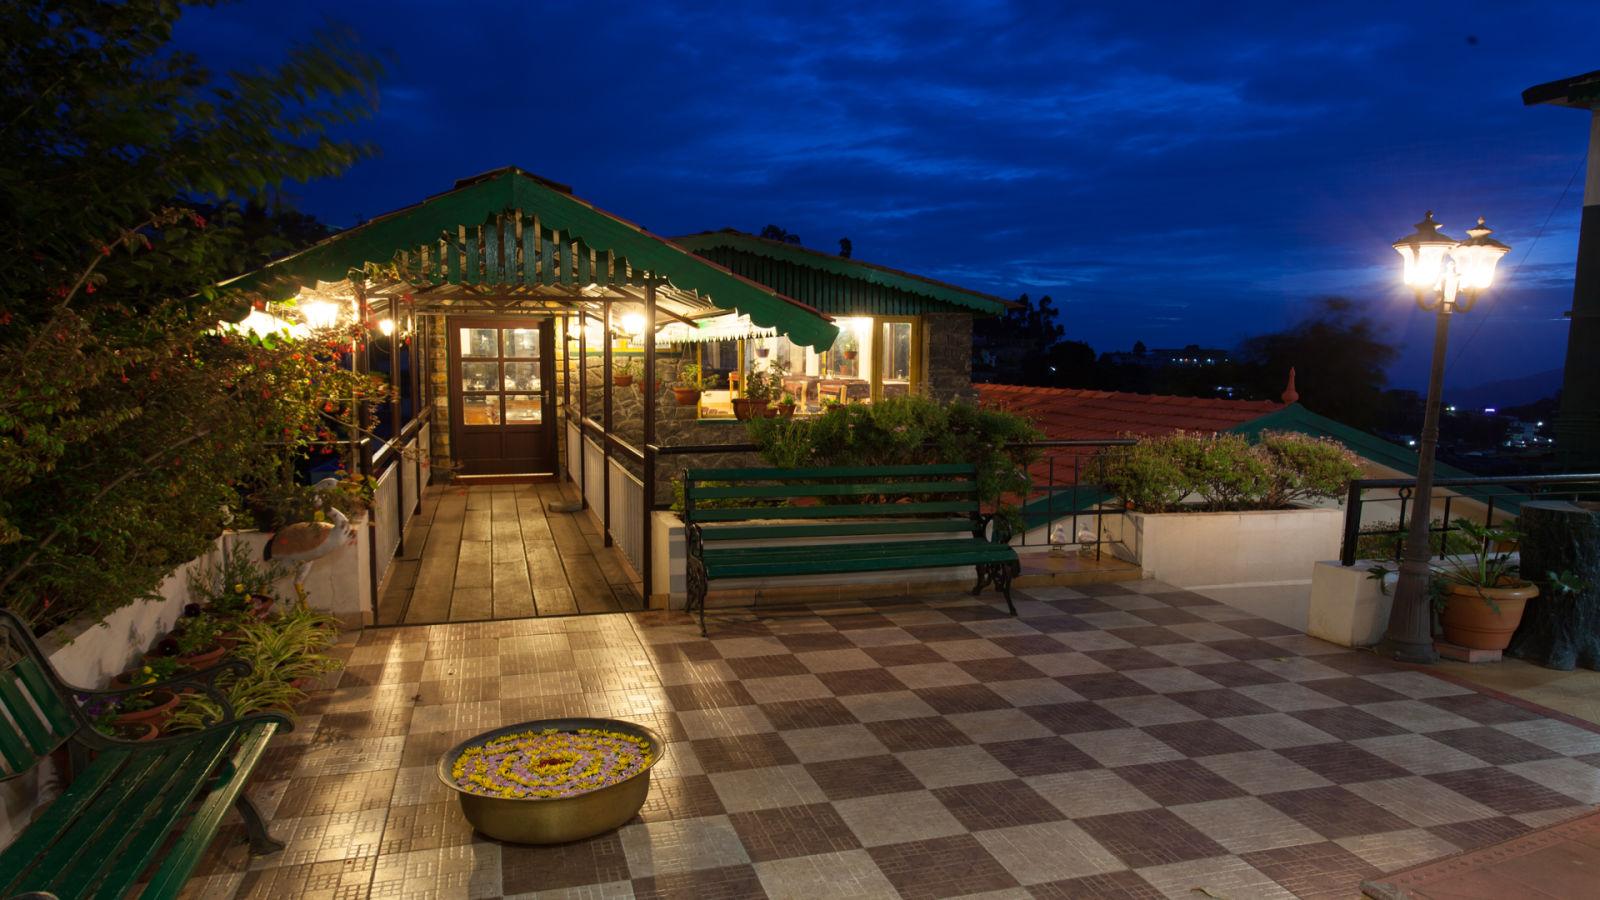 Restaurant Entrance Pine Borough Inn Kodaikanal Resort ylayfx